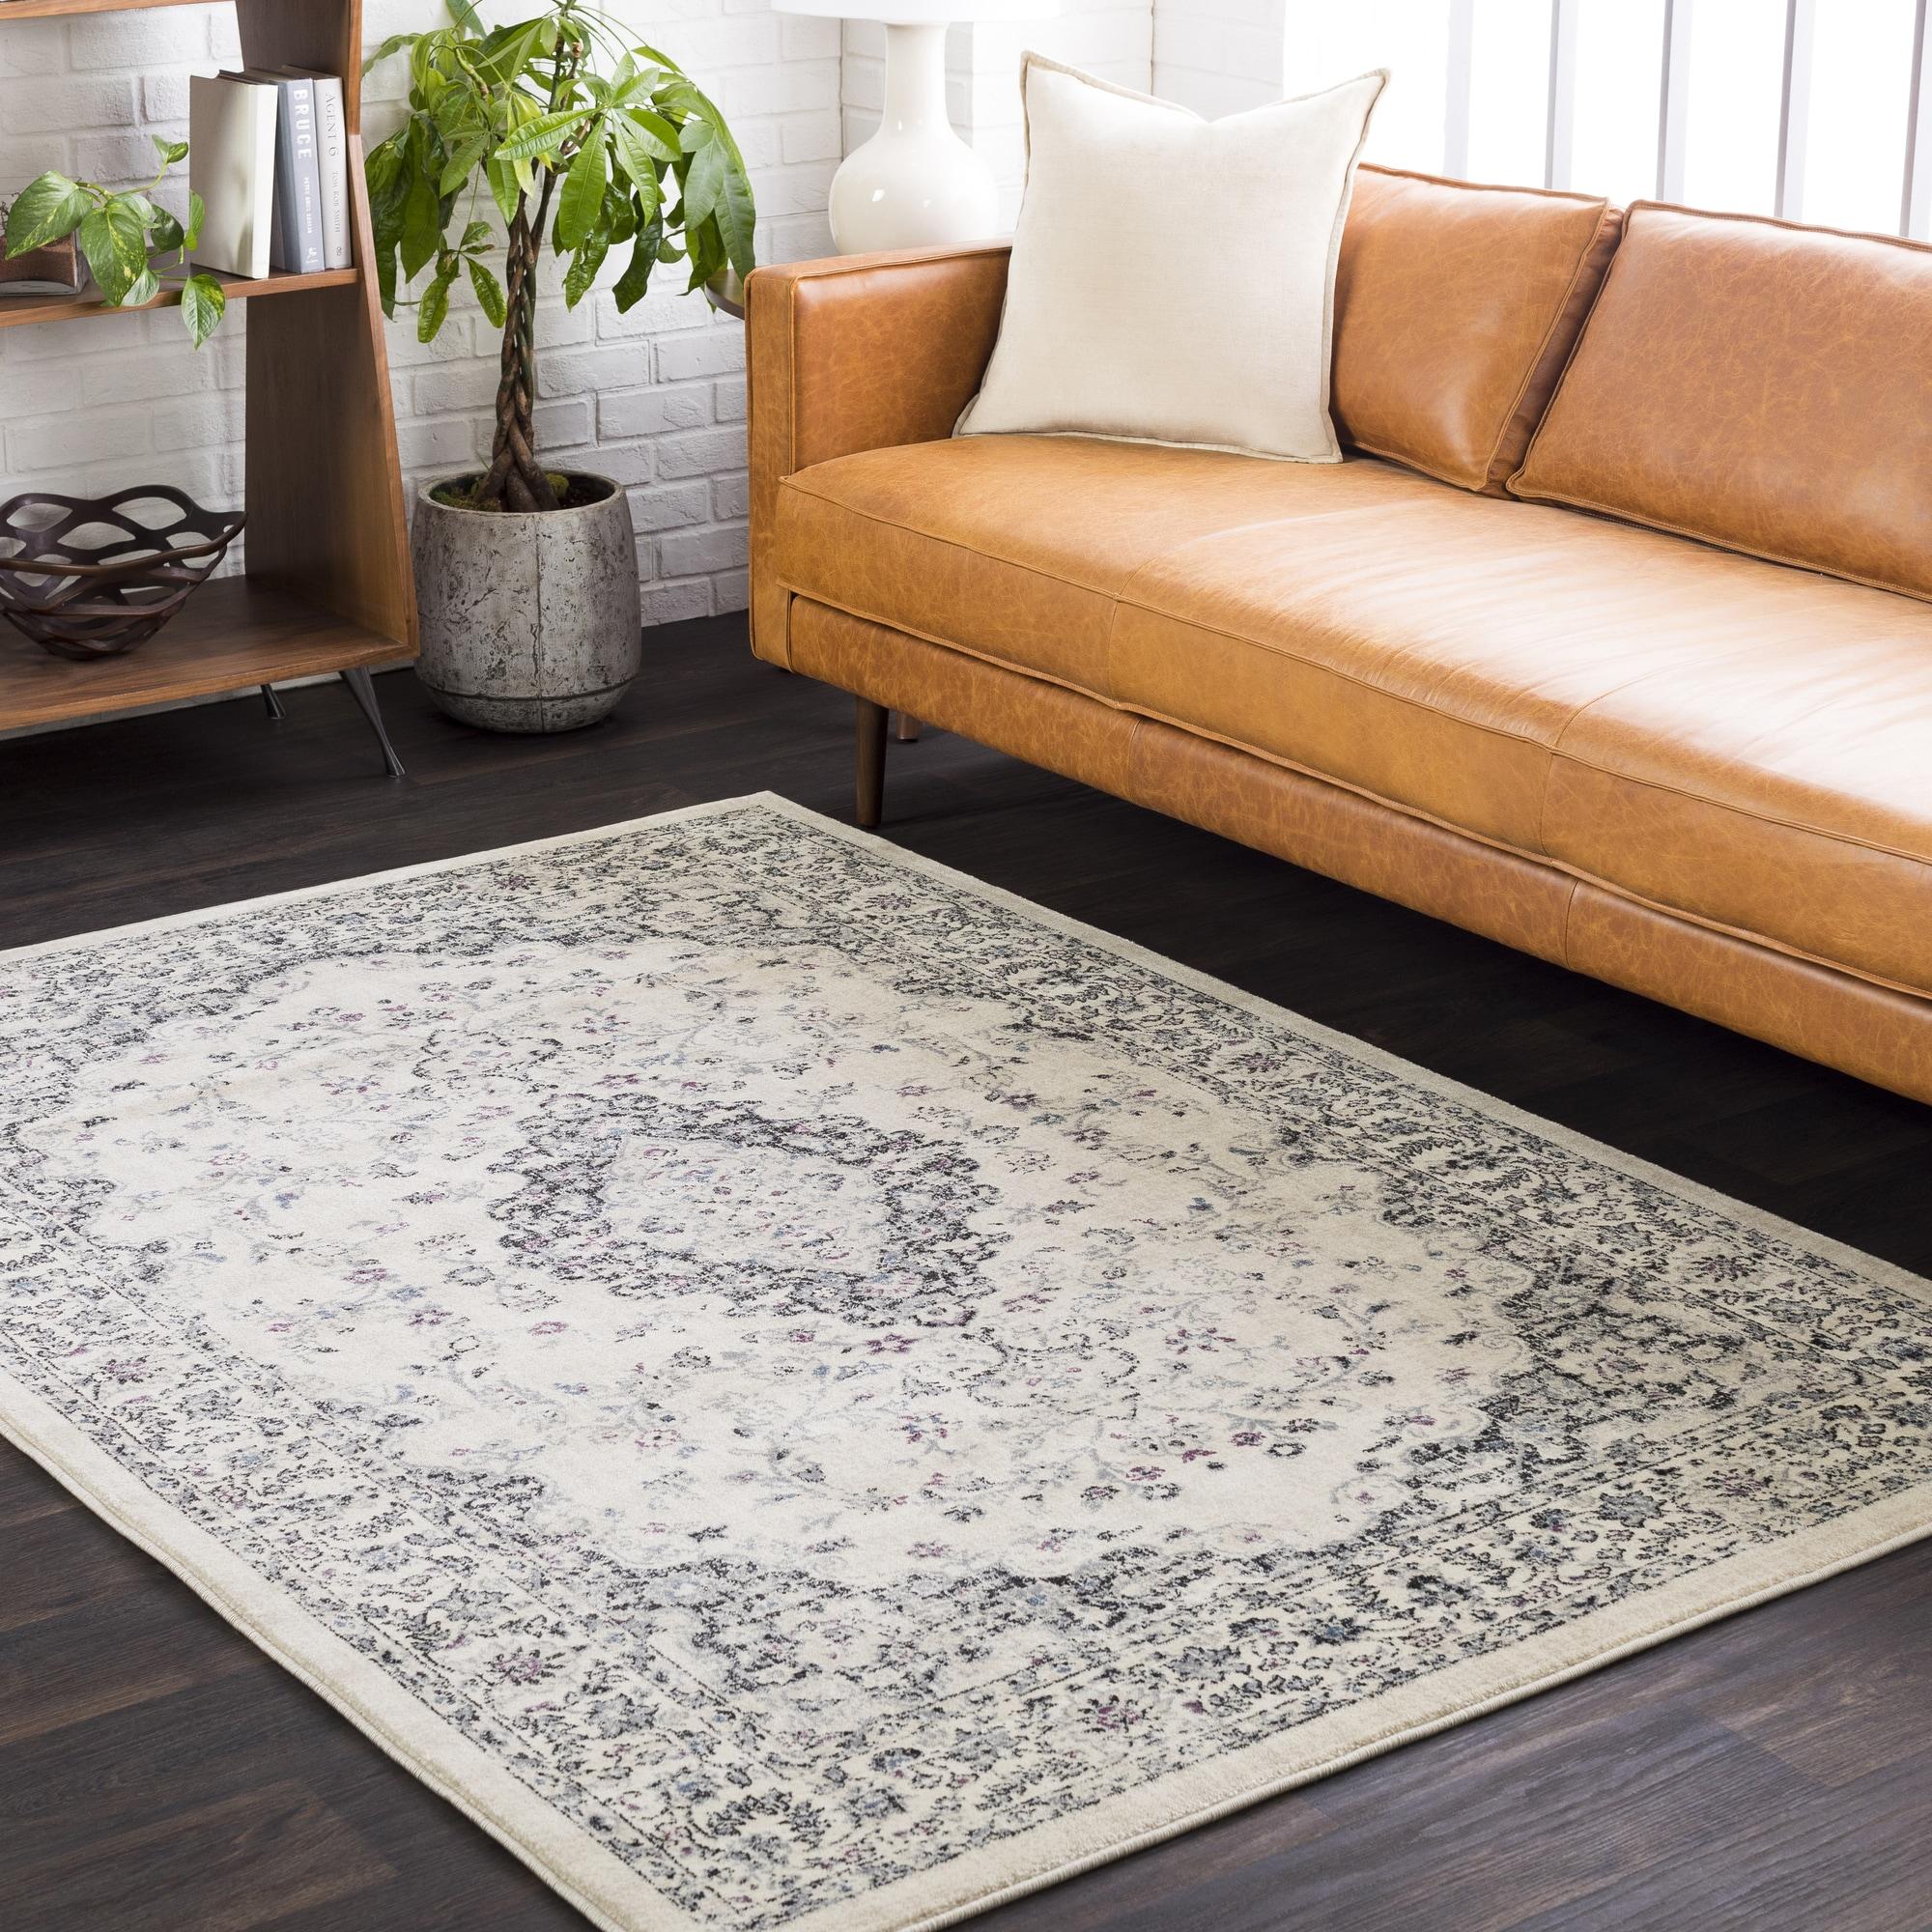 Bonnhan Traditional Oriental Area Rug (5'3 x 7'6)